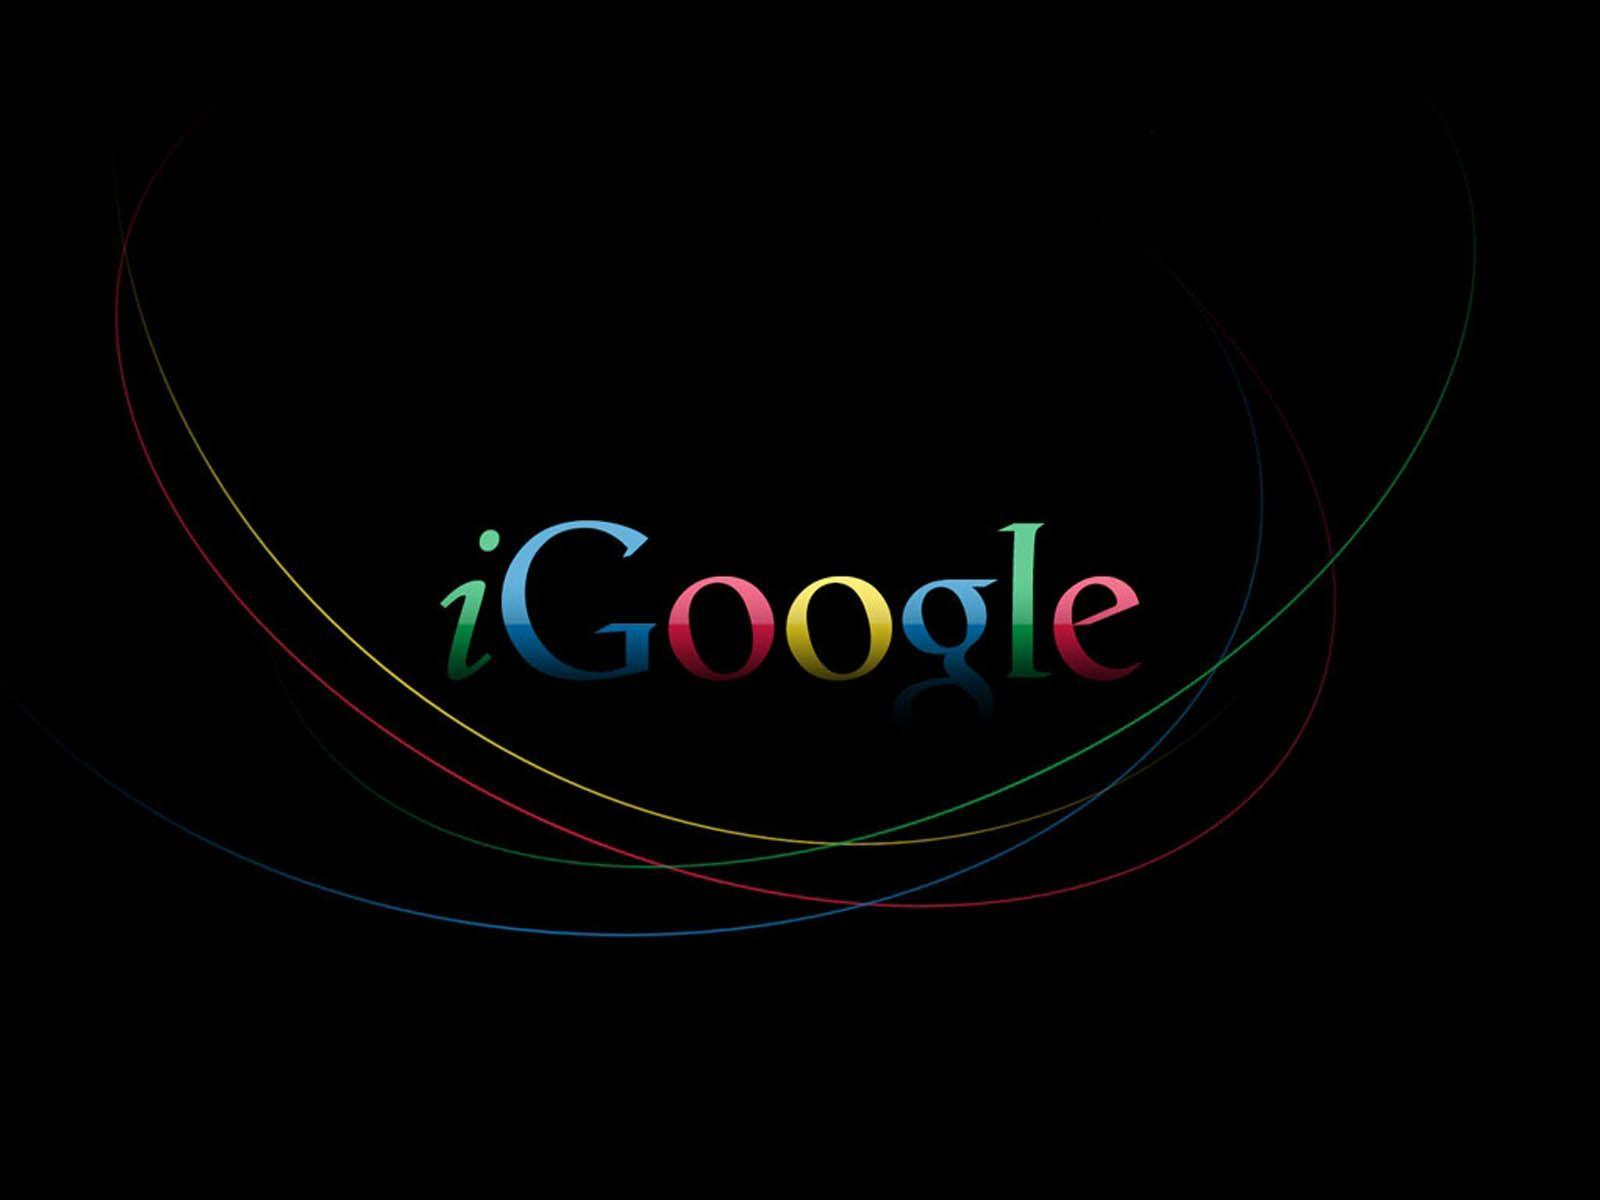 google background images wallpaper